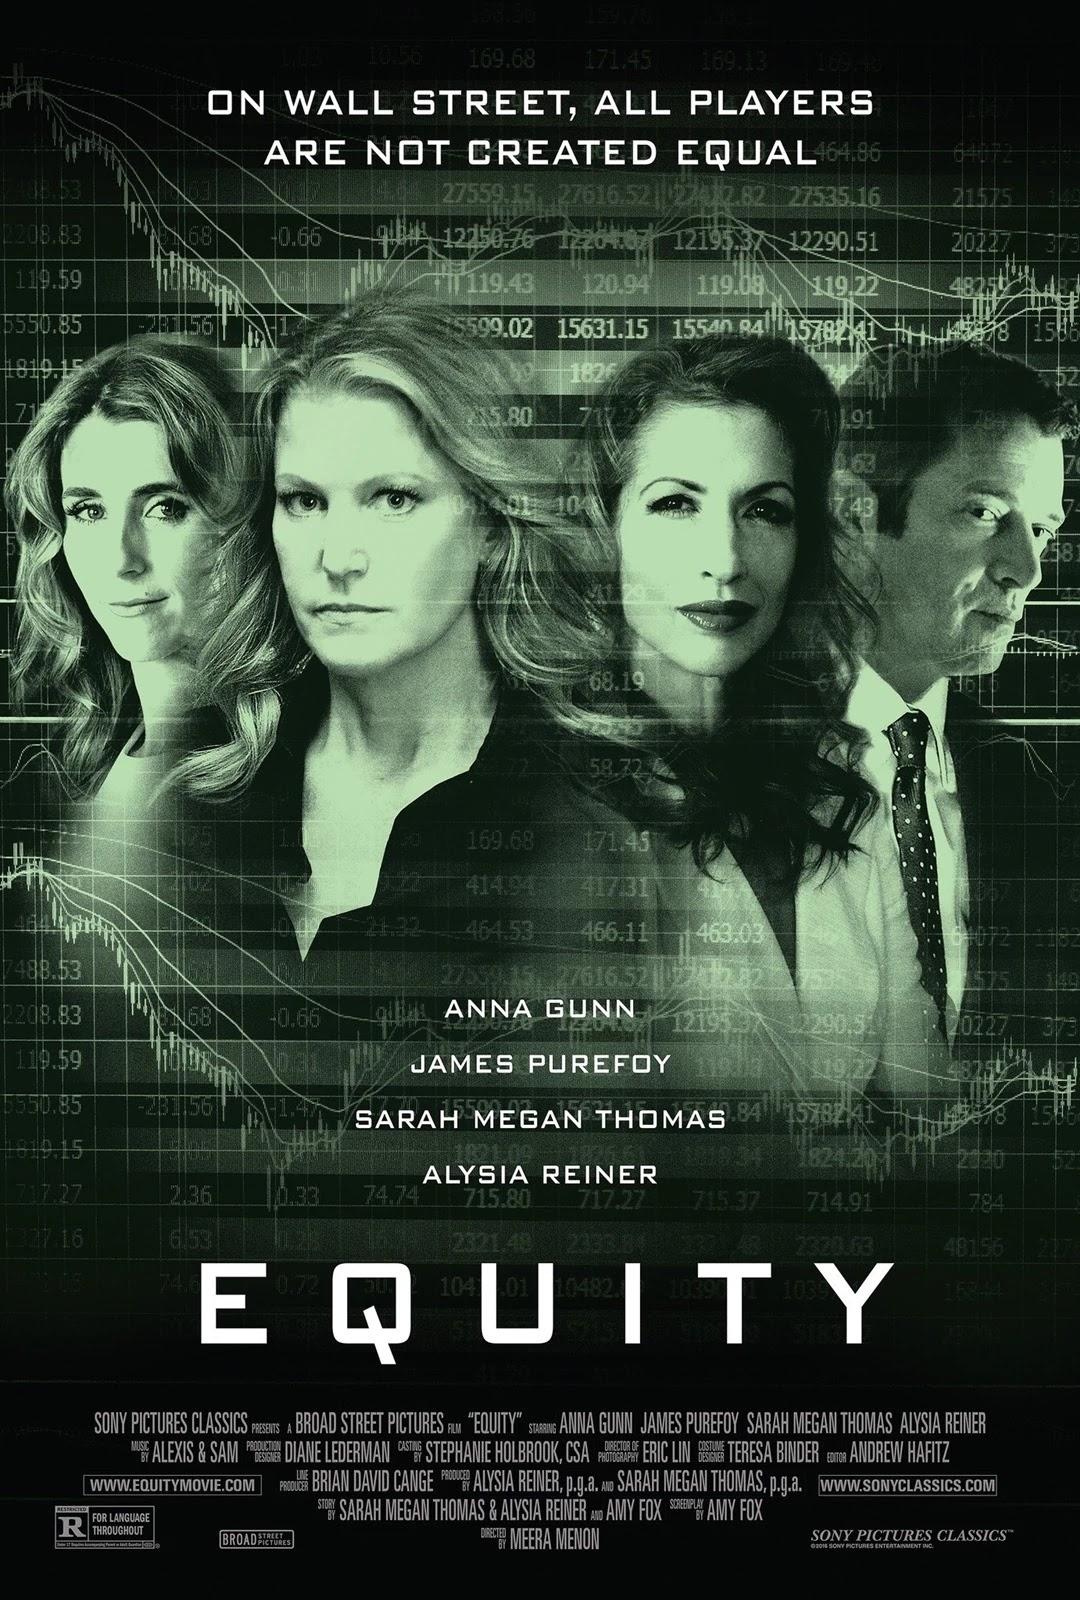 Equity,華爾街女王,權益,公正裁決